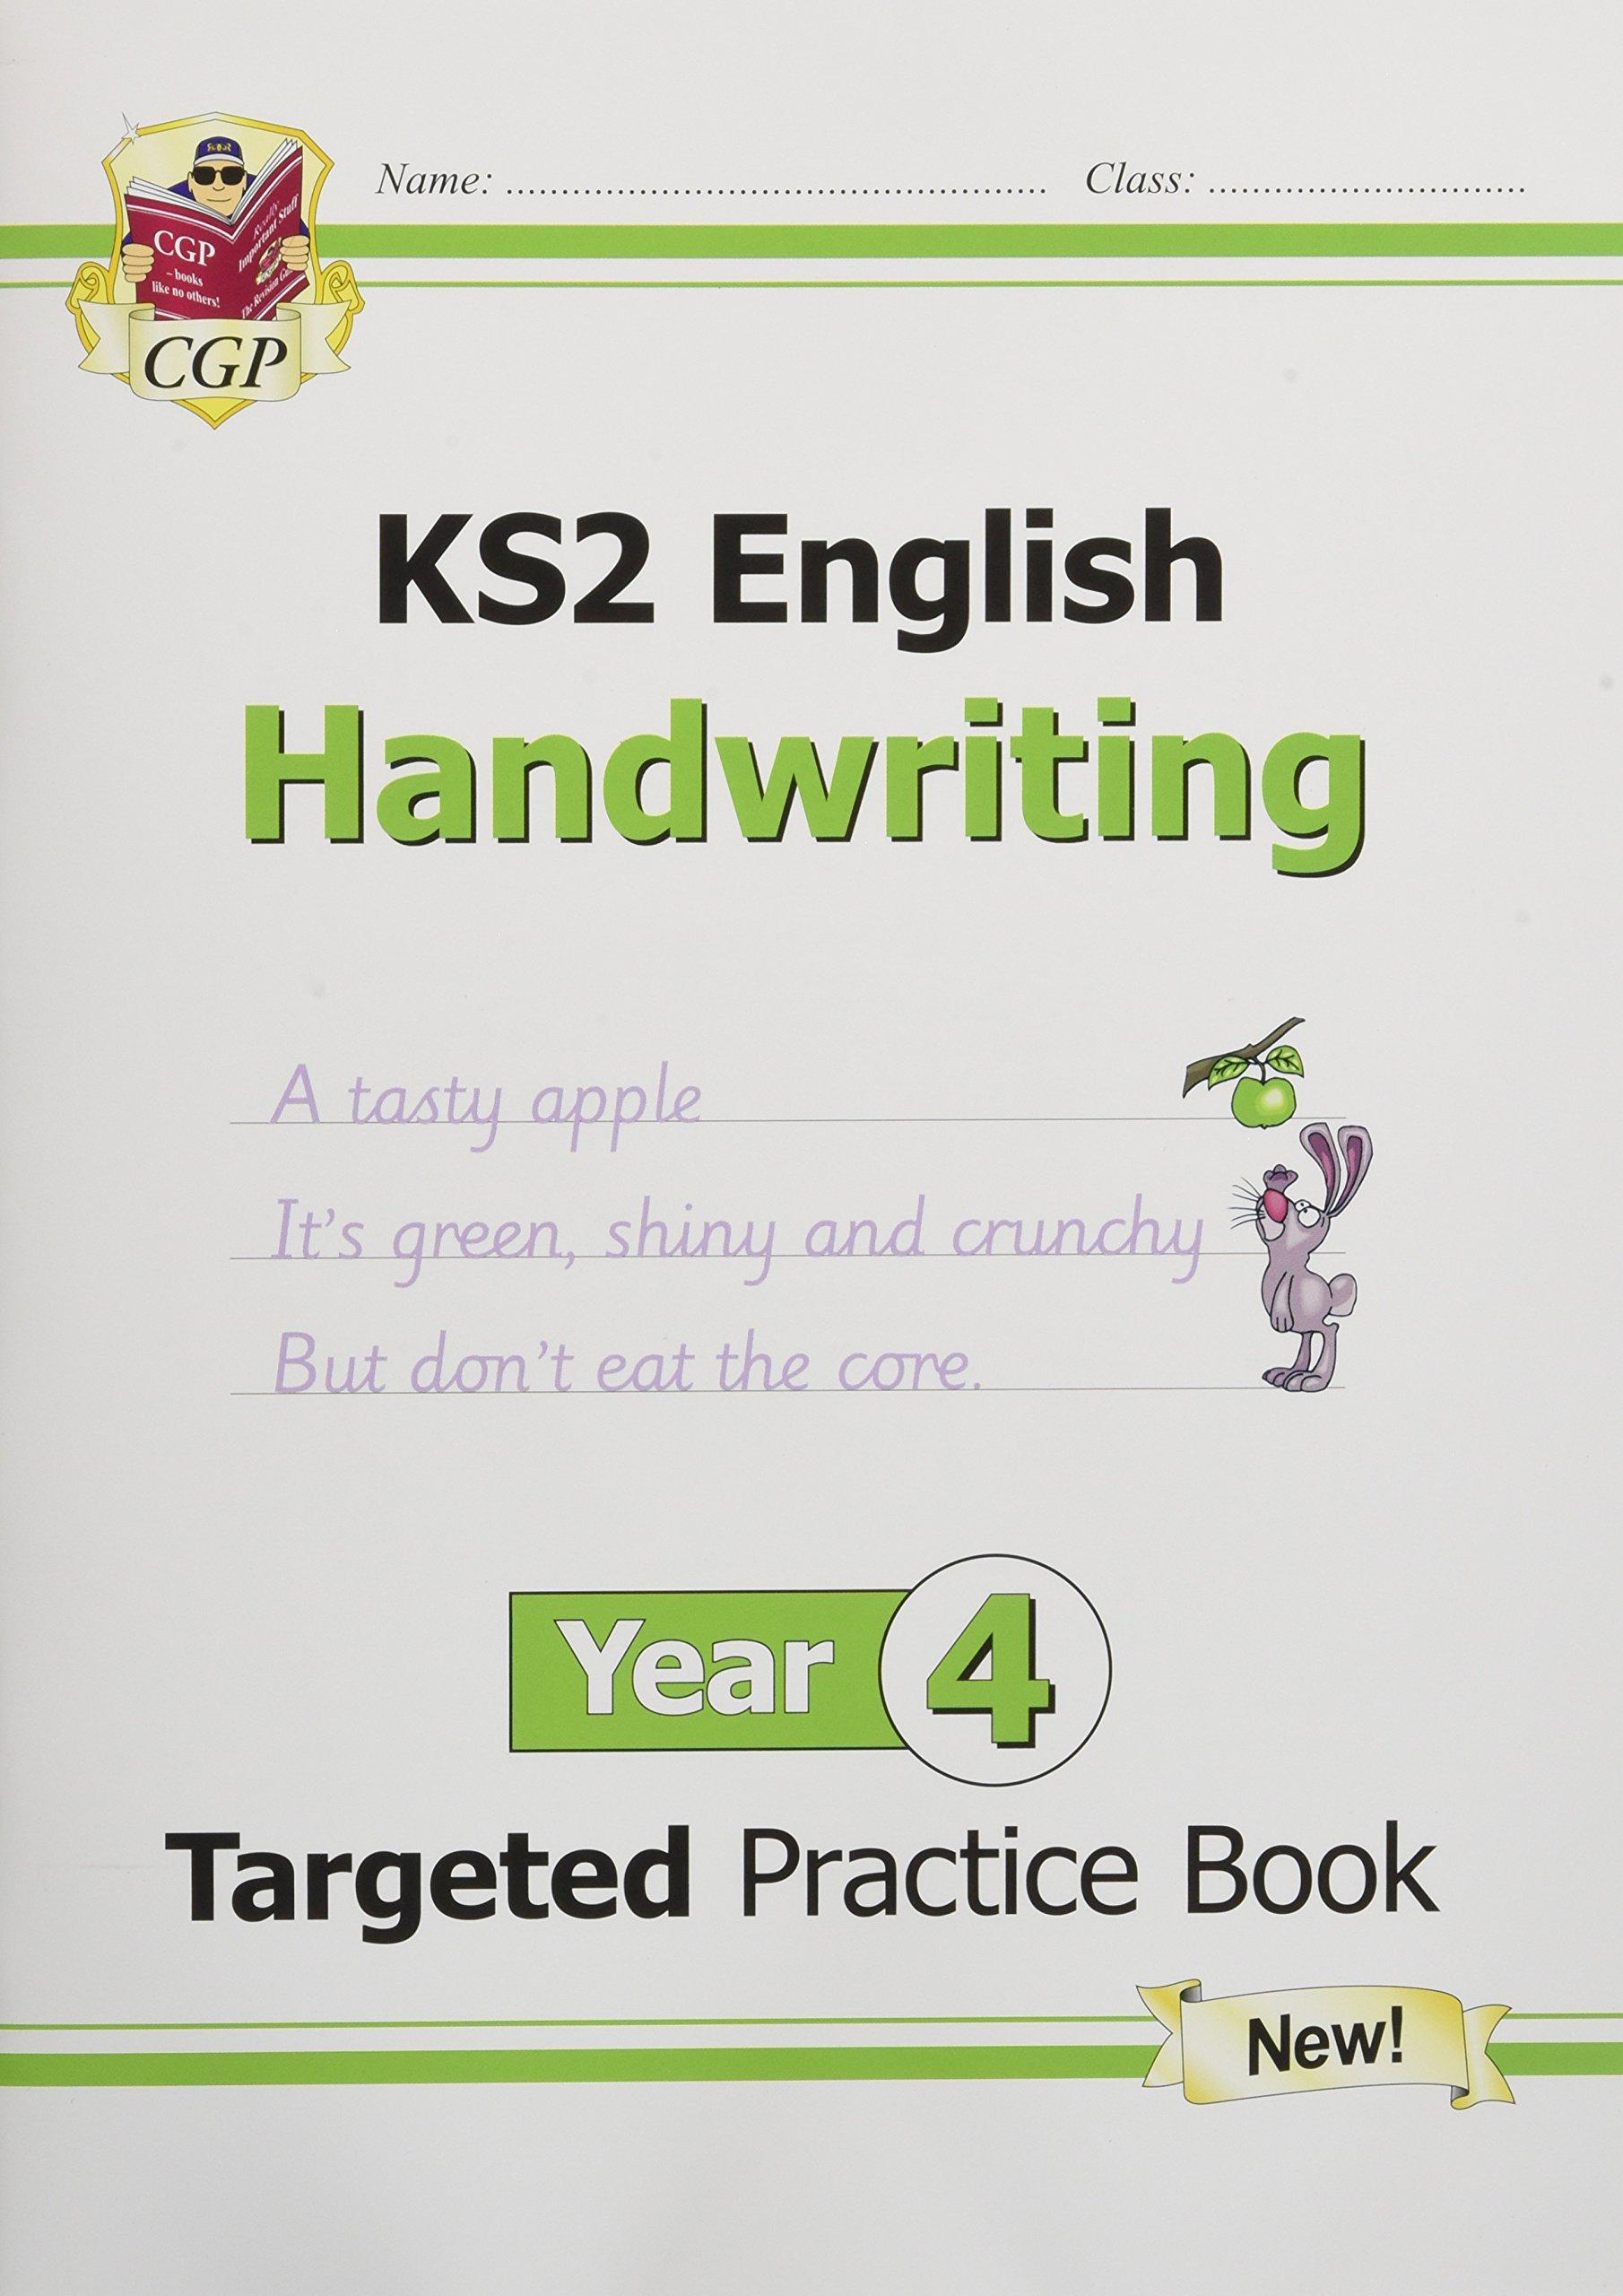 Handwriting worksheets ks2